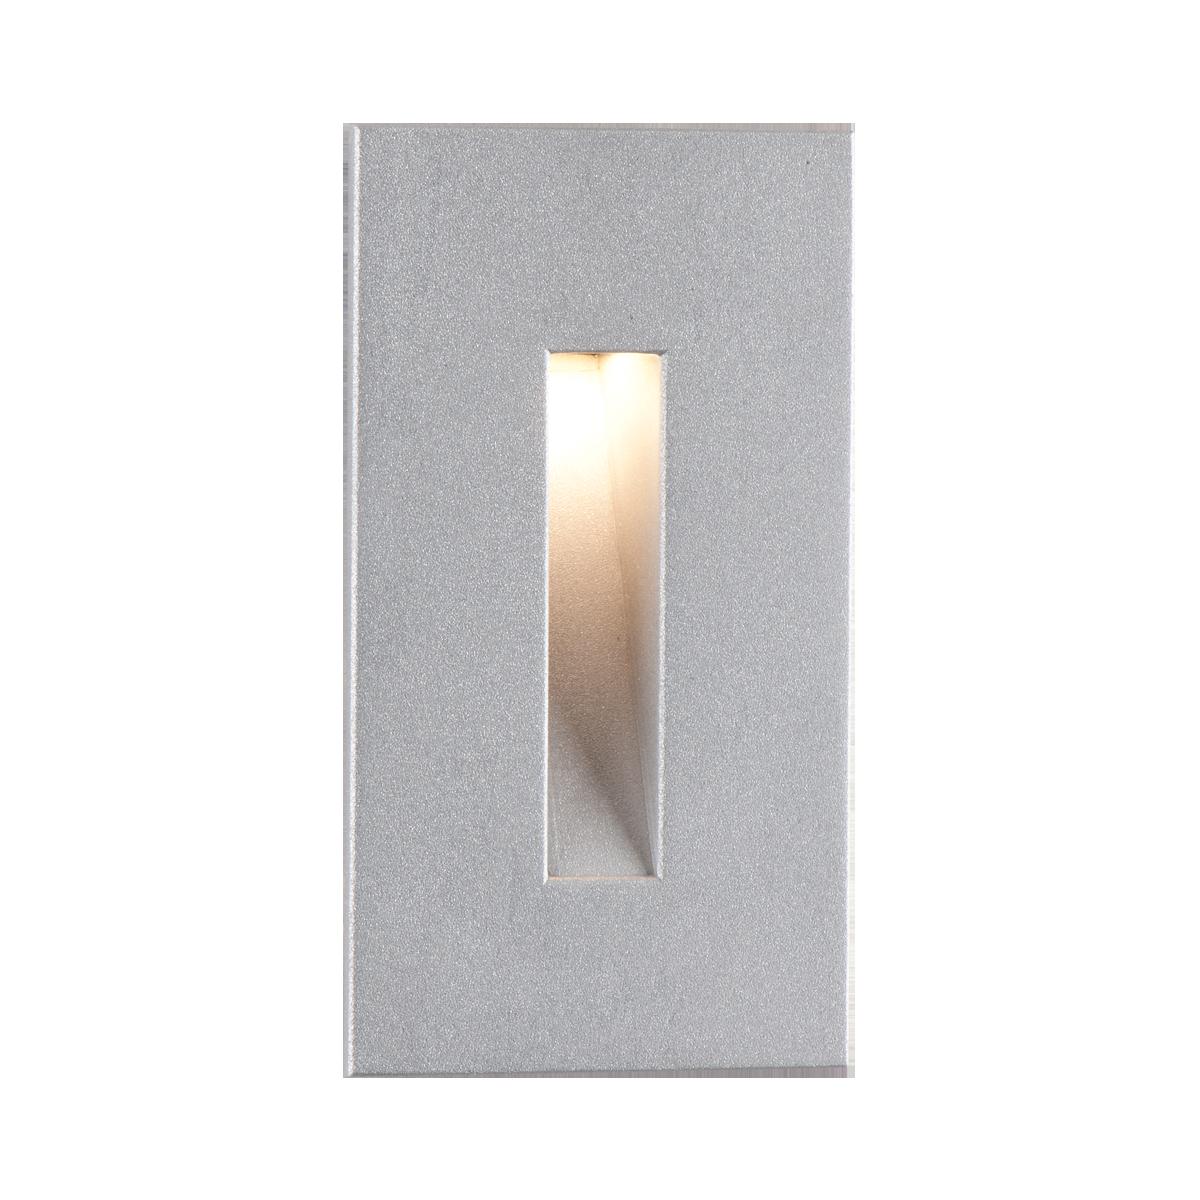 "4-1 - 2"" x 2-1 - 2"" LED Step Light, Silver Metallic Finish"